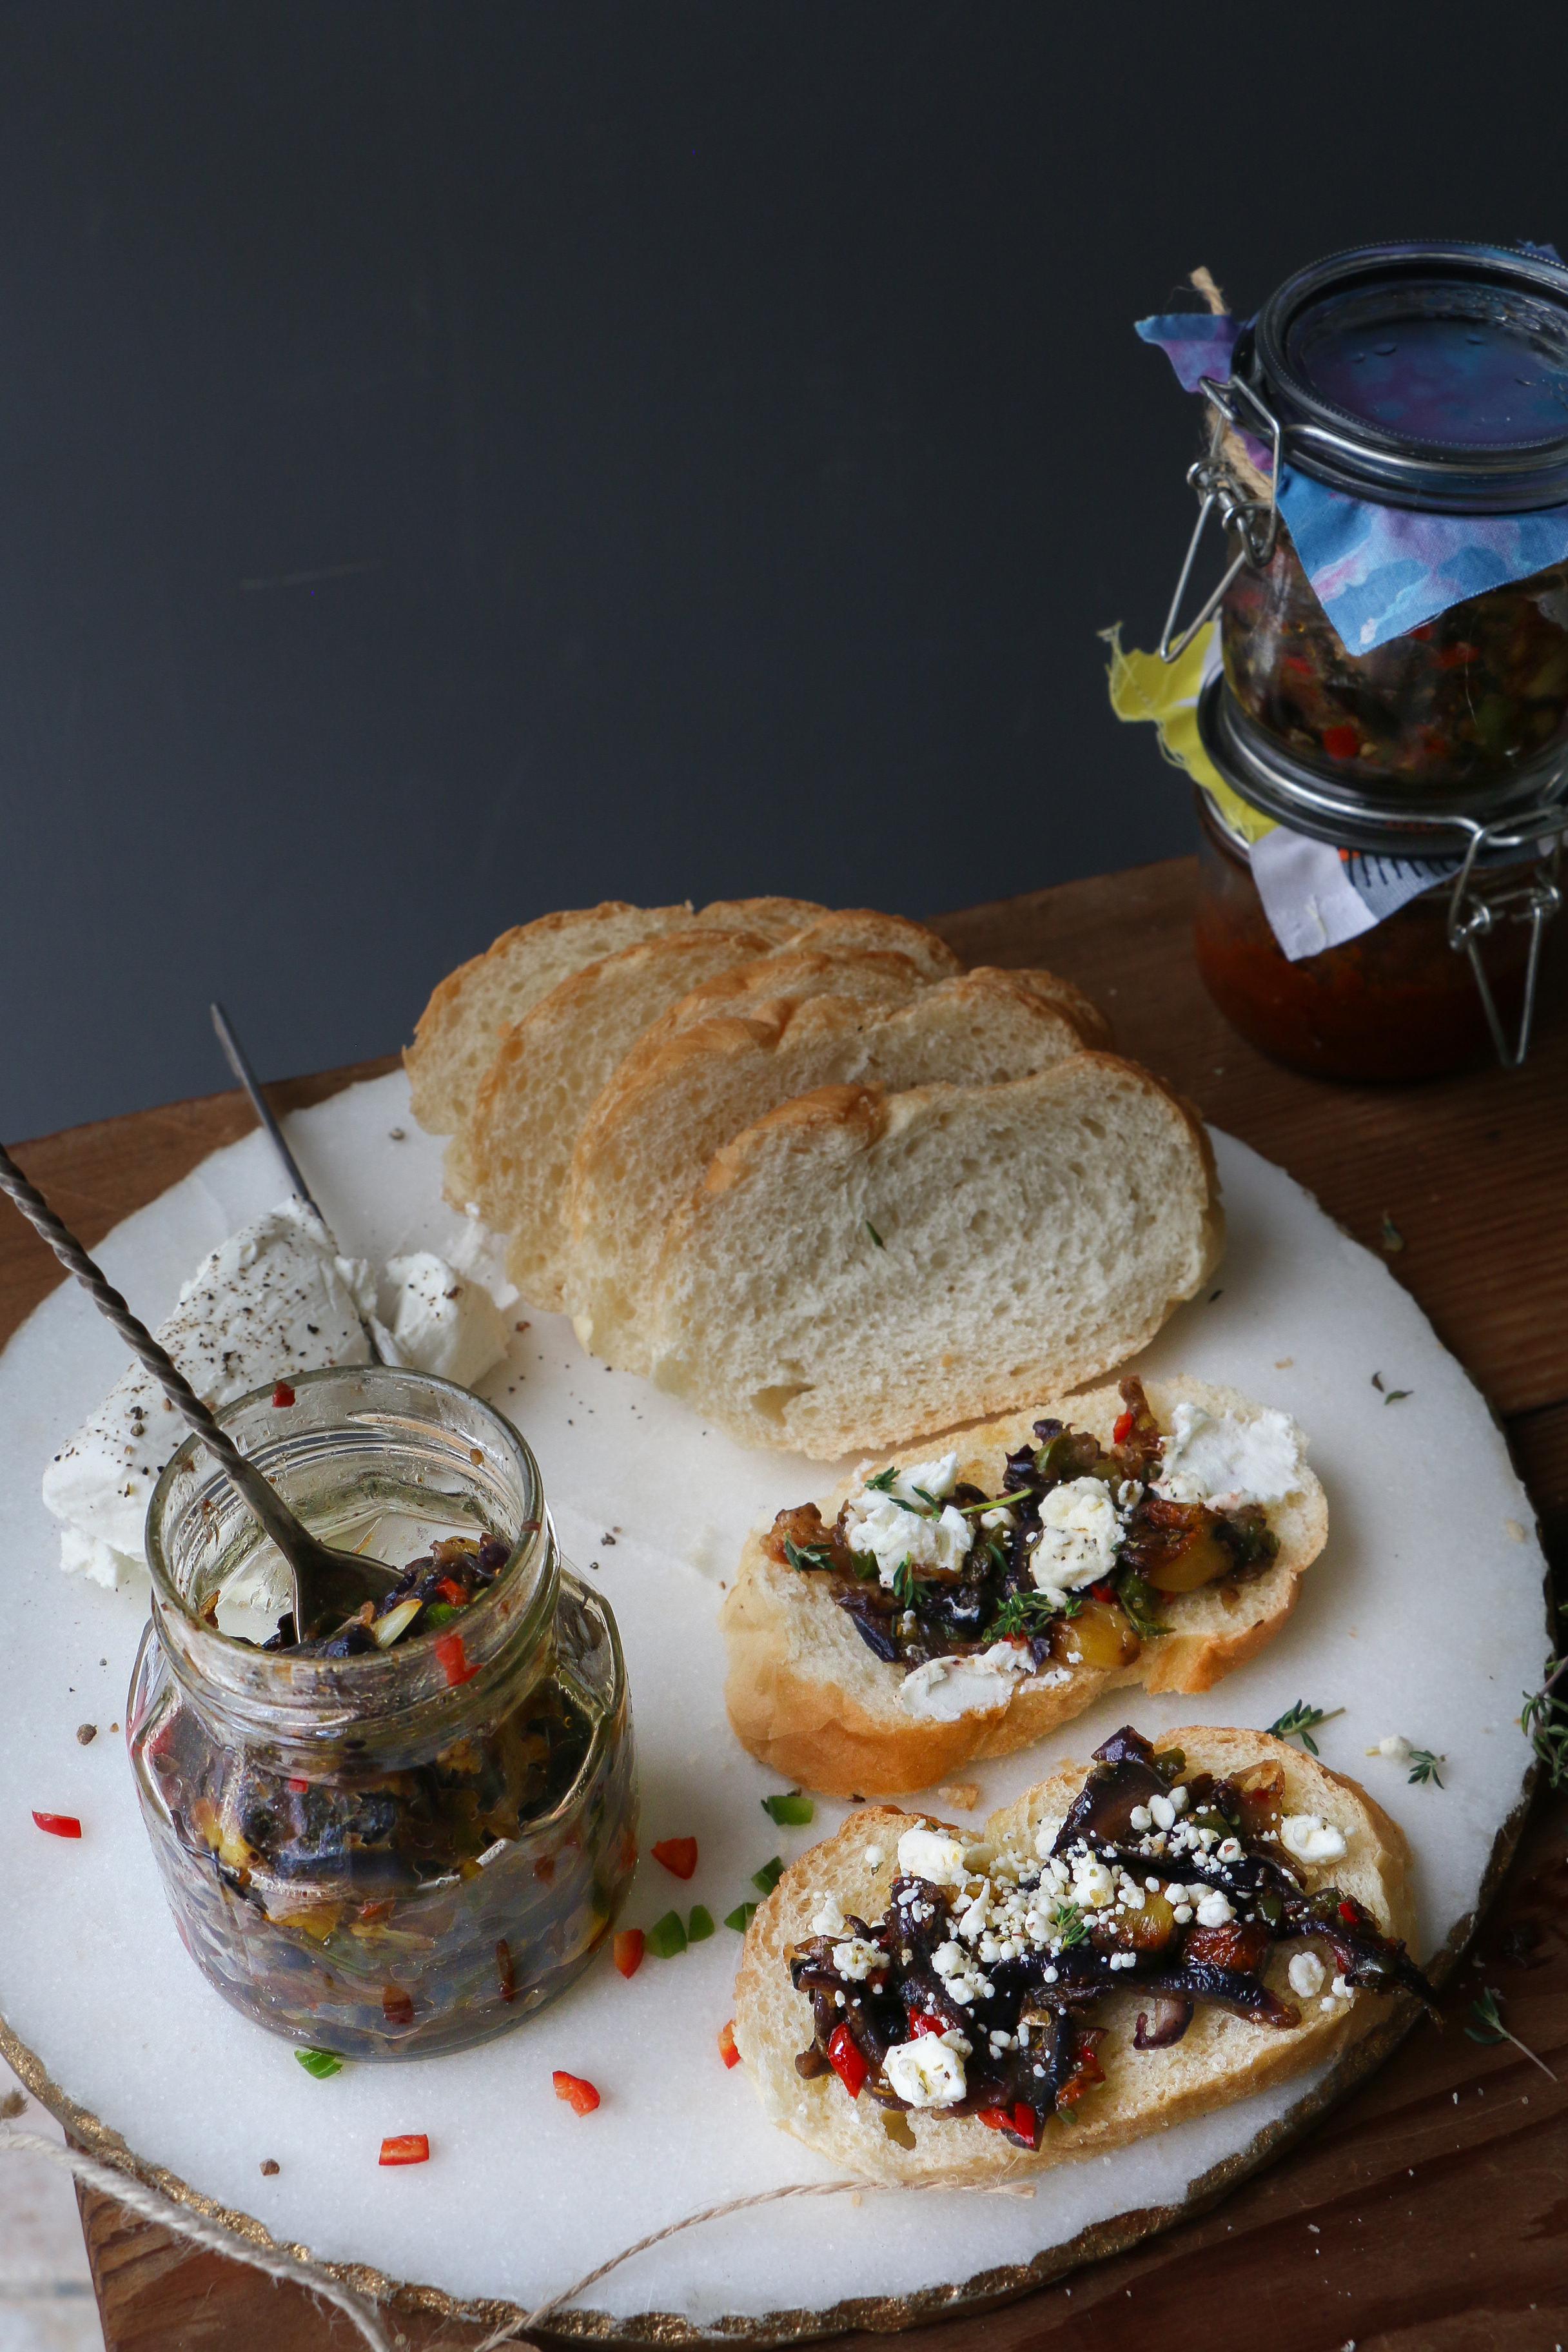 Roasted Garlic and Onion Relish in pickling spices/Bruschetta |foodfashionparty| #garlic